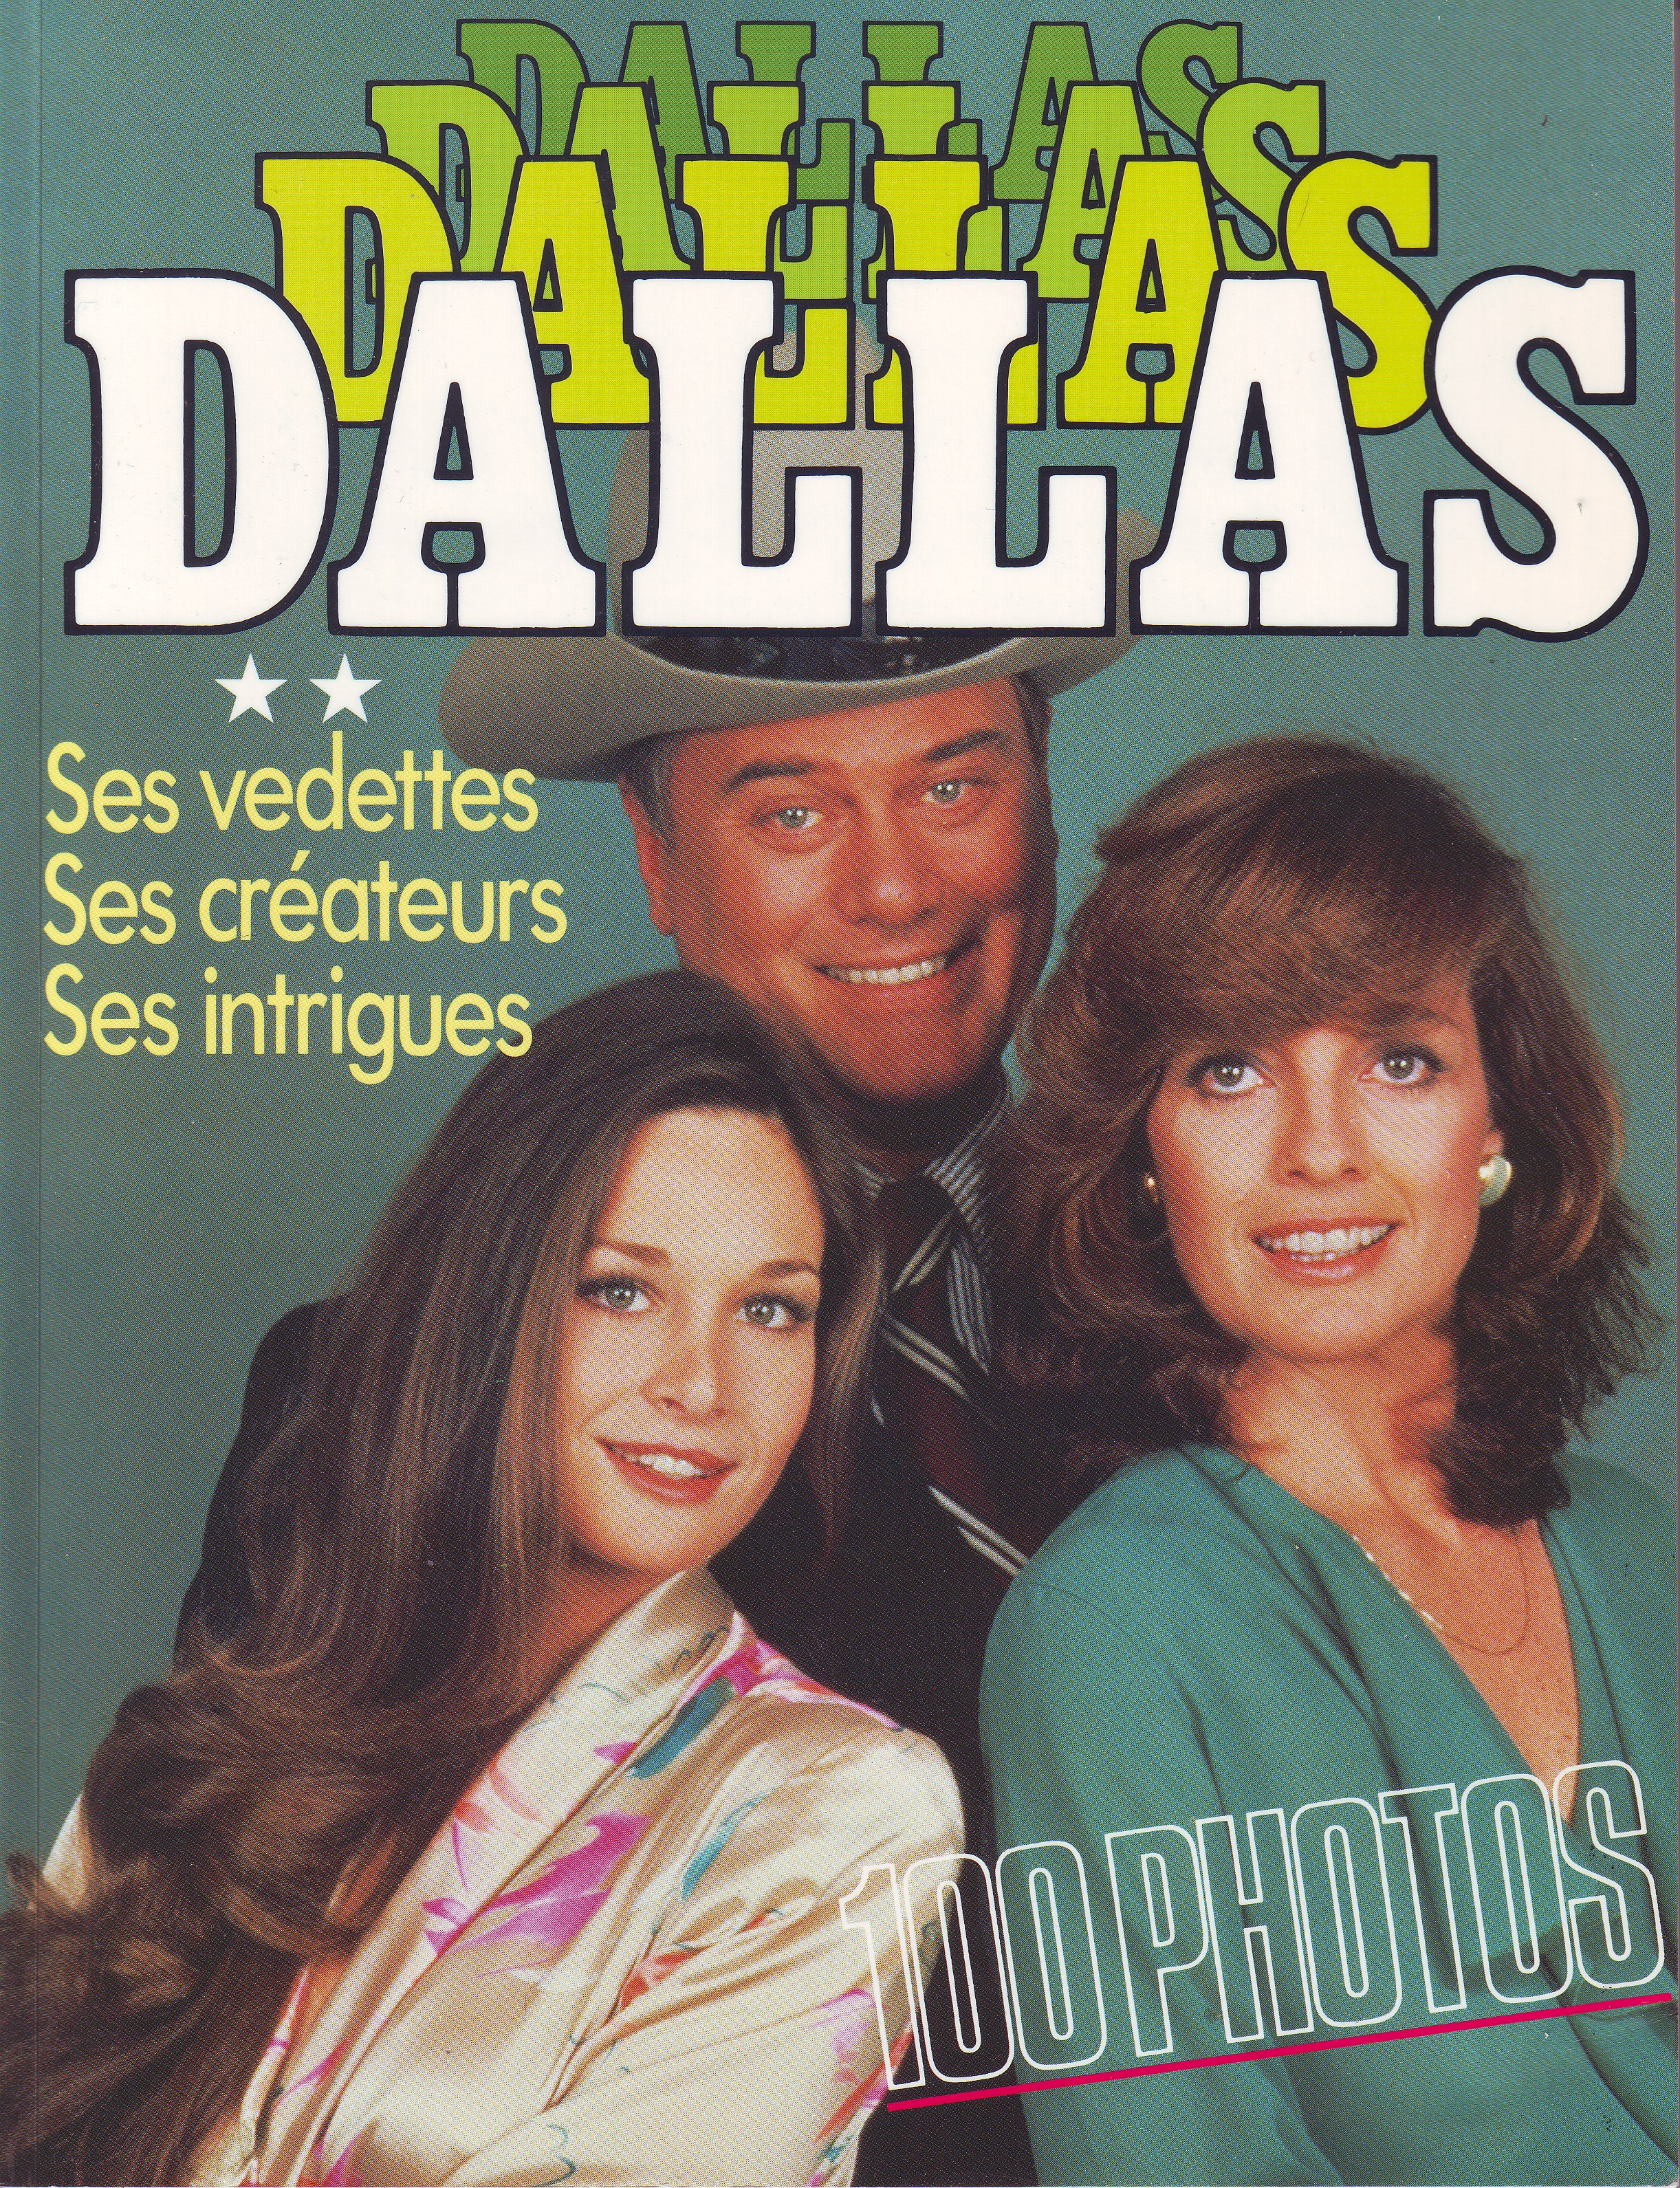 DALLAS, mon univers impitoyable ! - Page 2 Dallas4